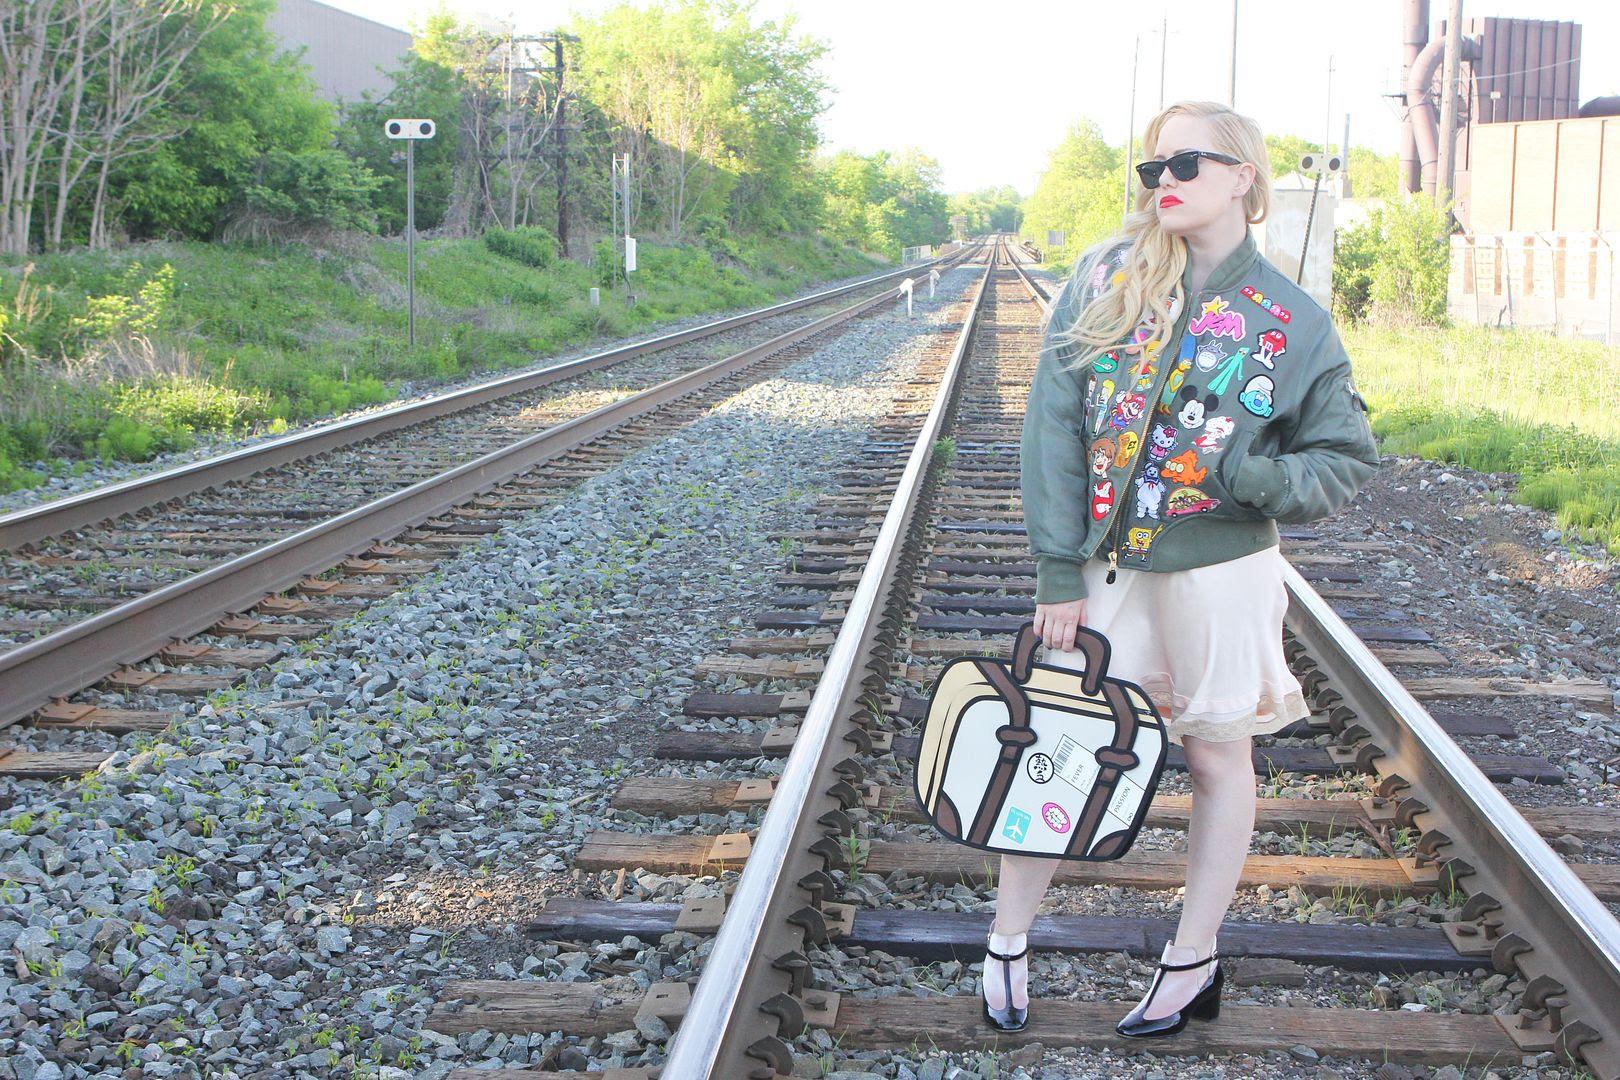 photo patchjacket-jumpfrompaper-lingerie-caillibeckerman-railroad_zps89125177.jpg